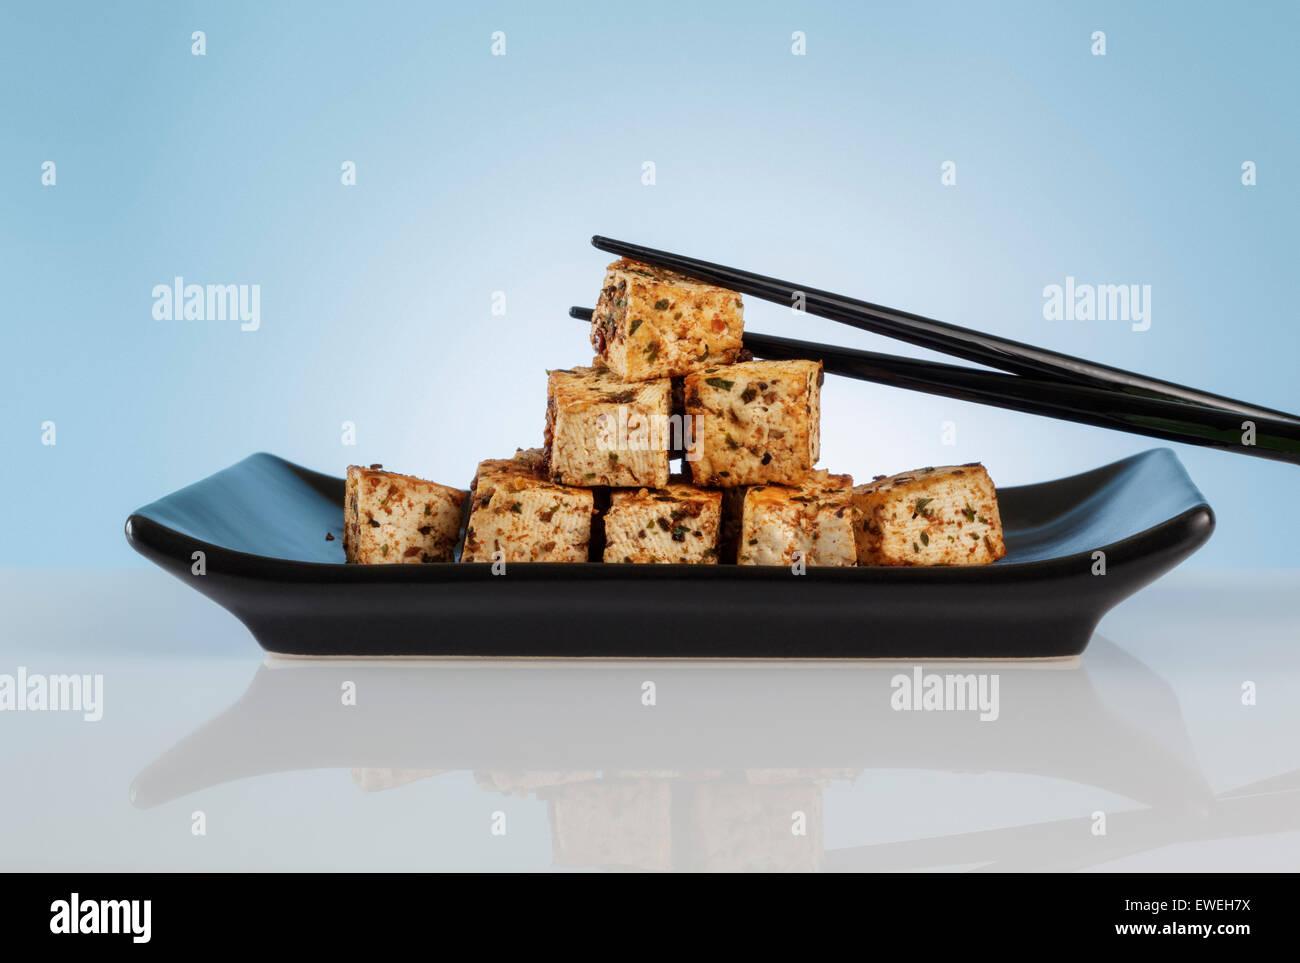 Spiced Tofu Cubes on black Dish - Stock Image